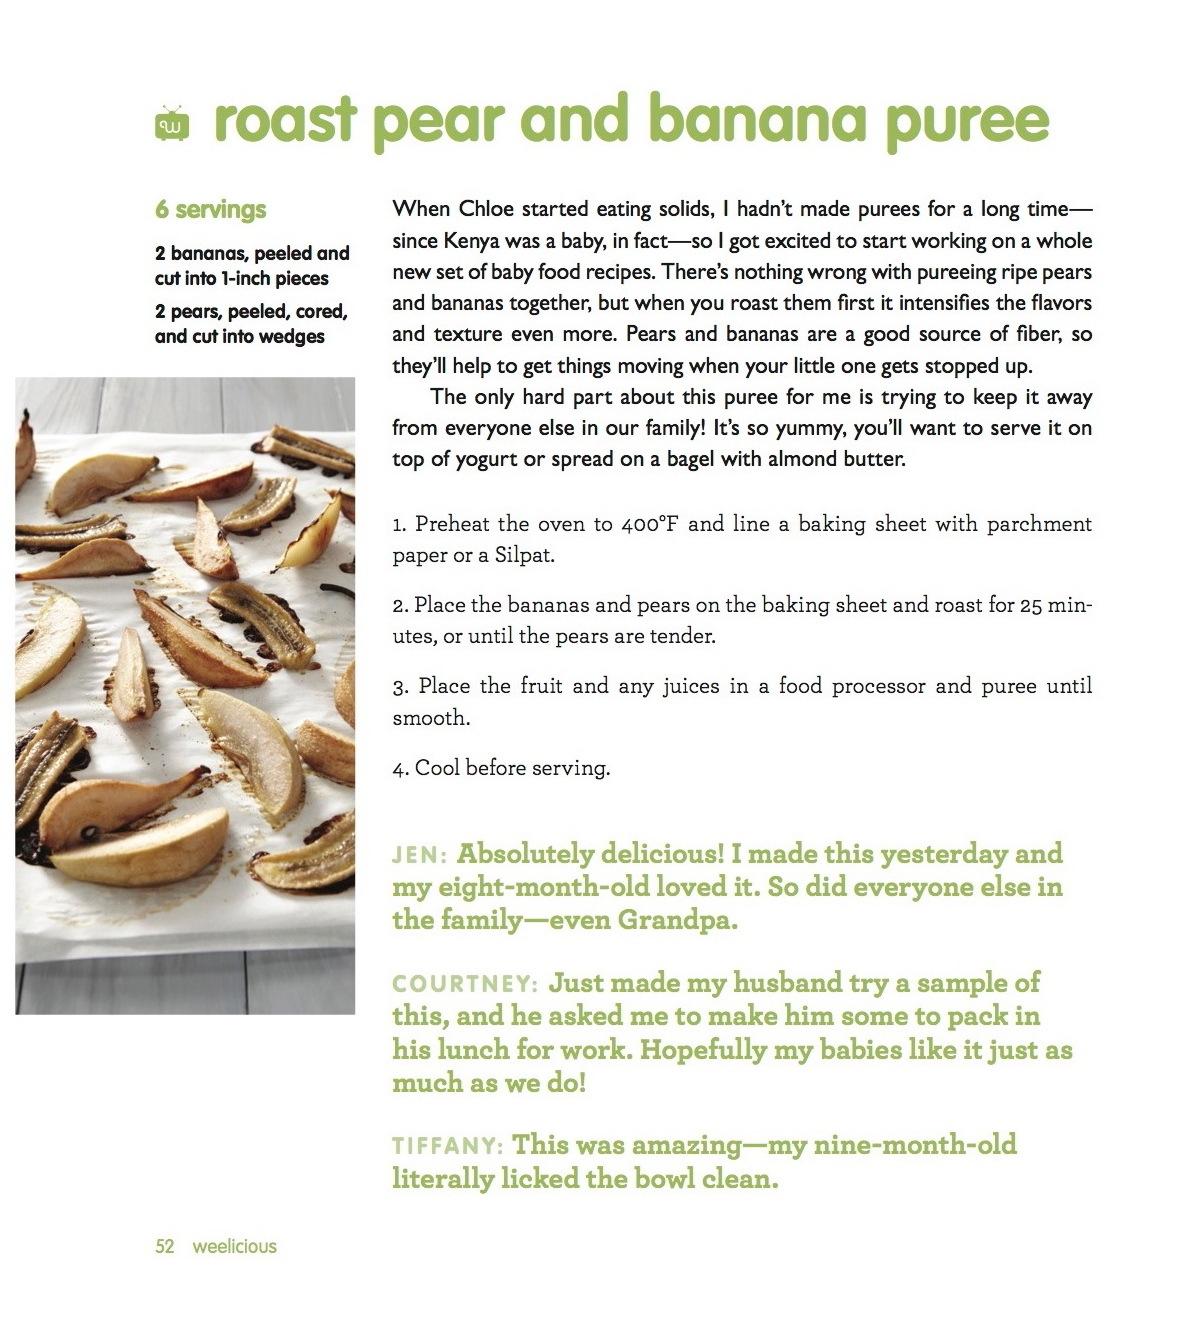 Weelicious Roast Pear and Banana Puree